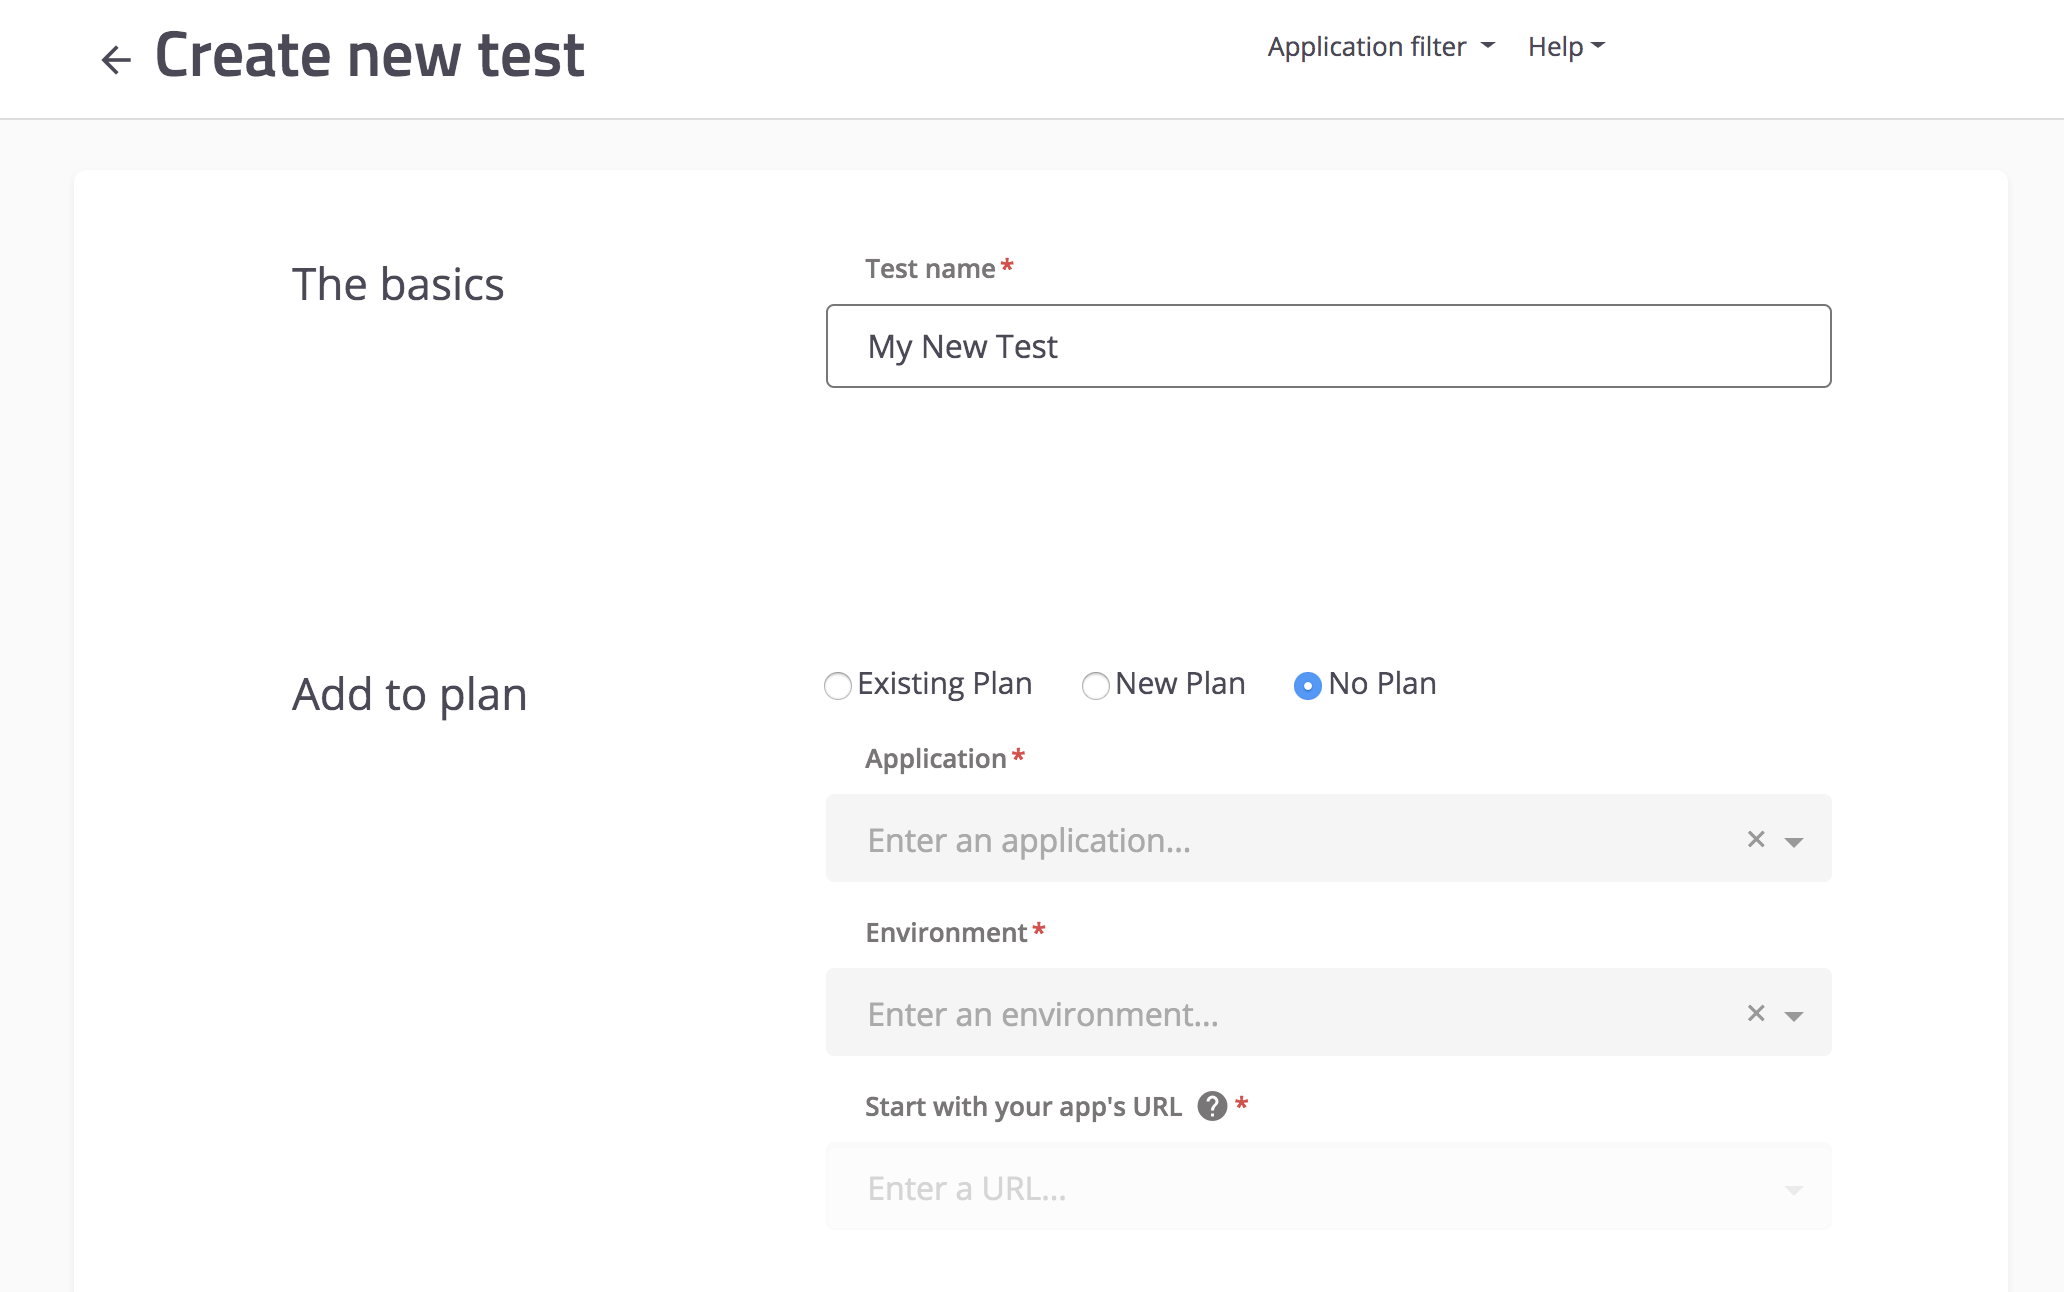 Basics of new test setup